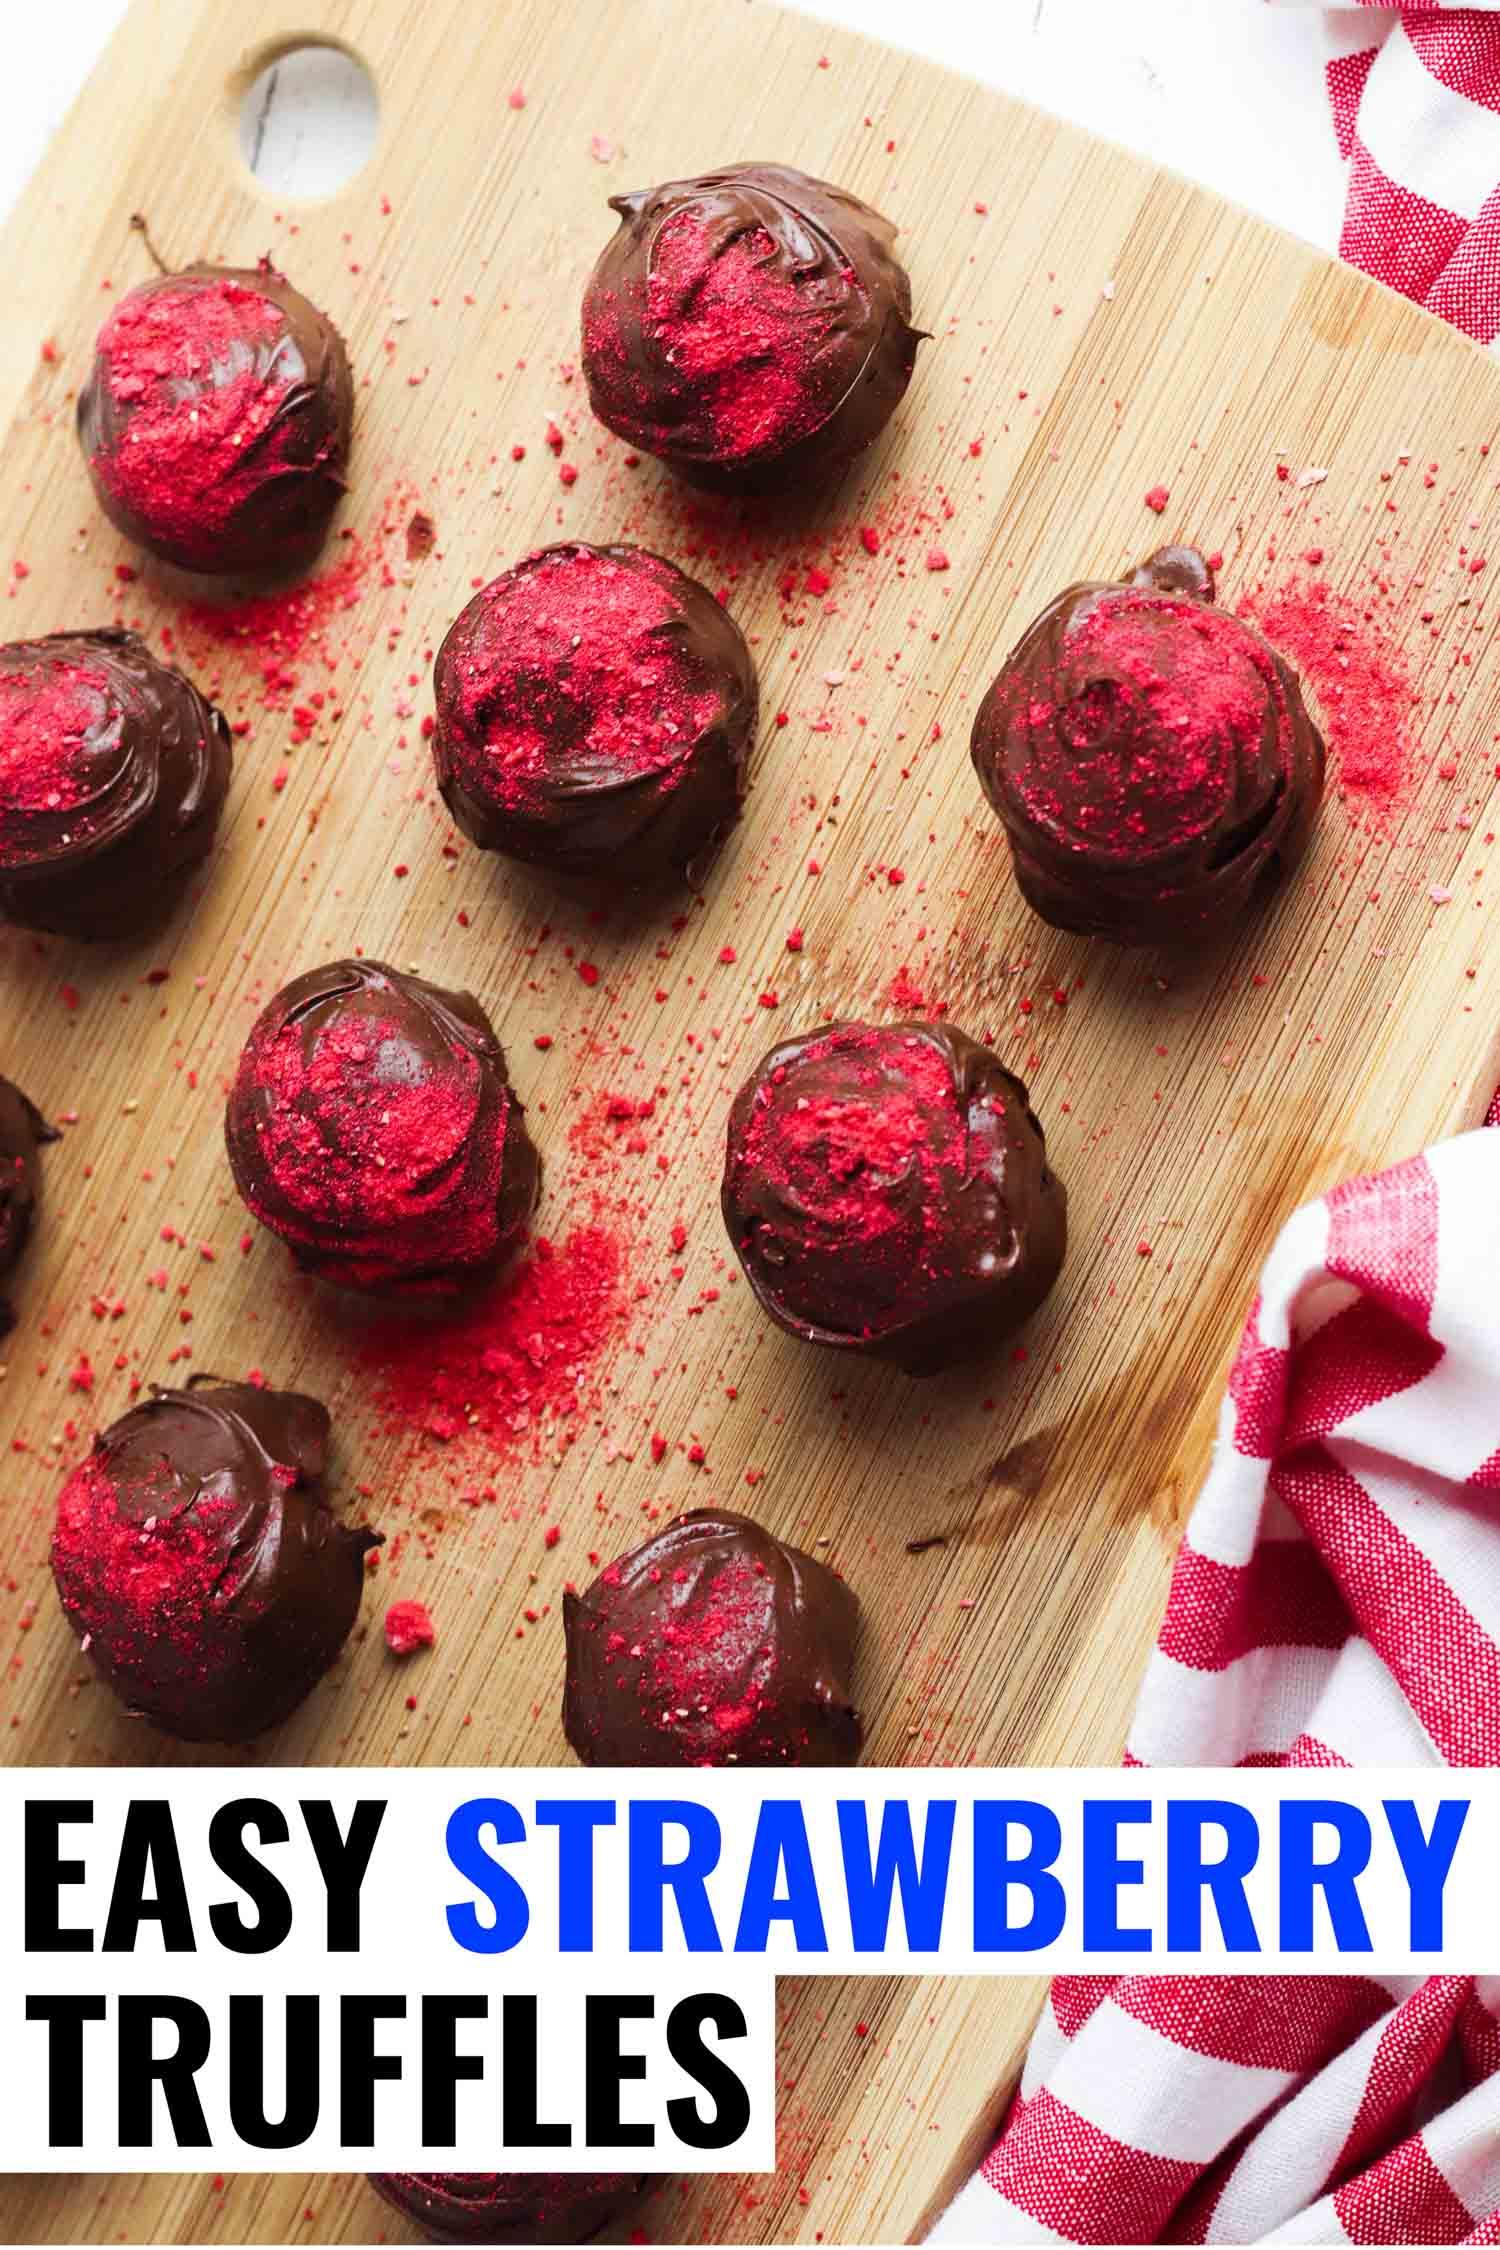 Chocolate strawberry truffles on a cutting board